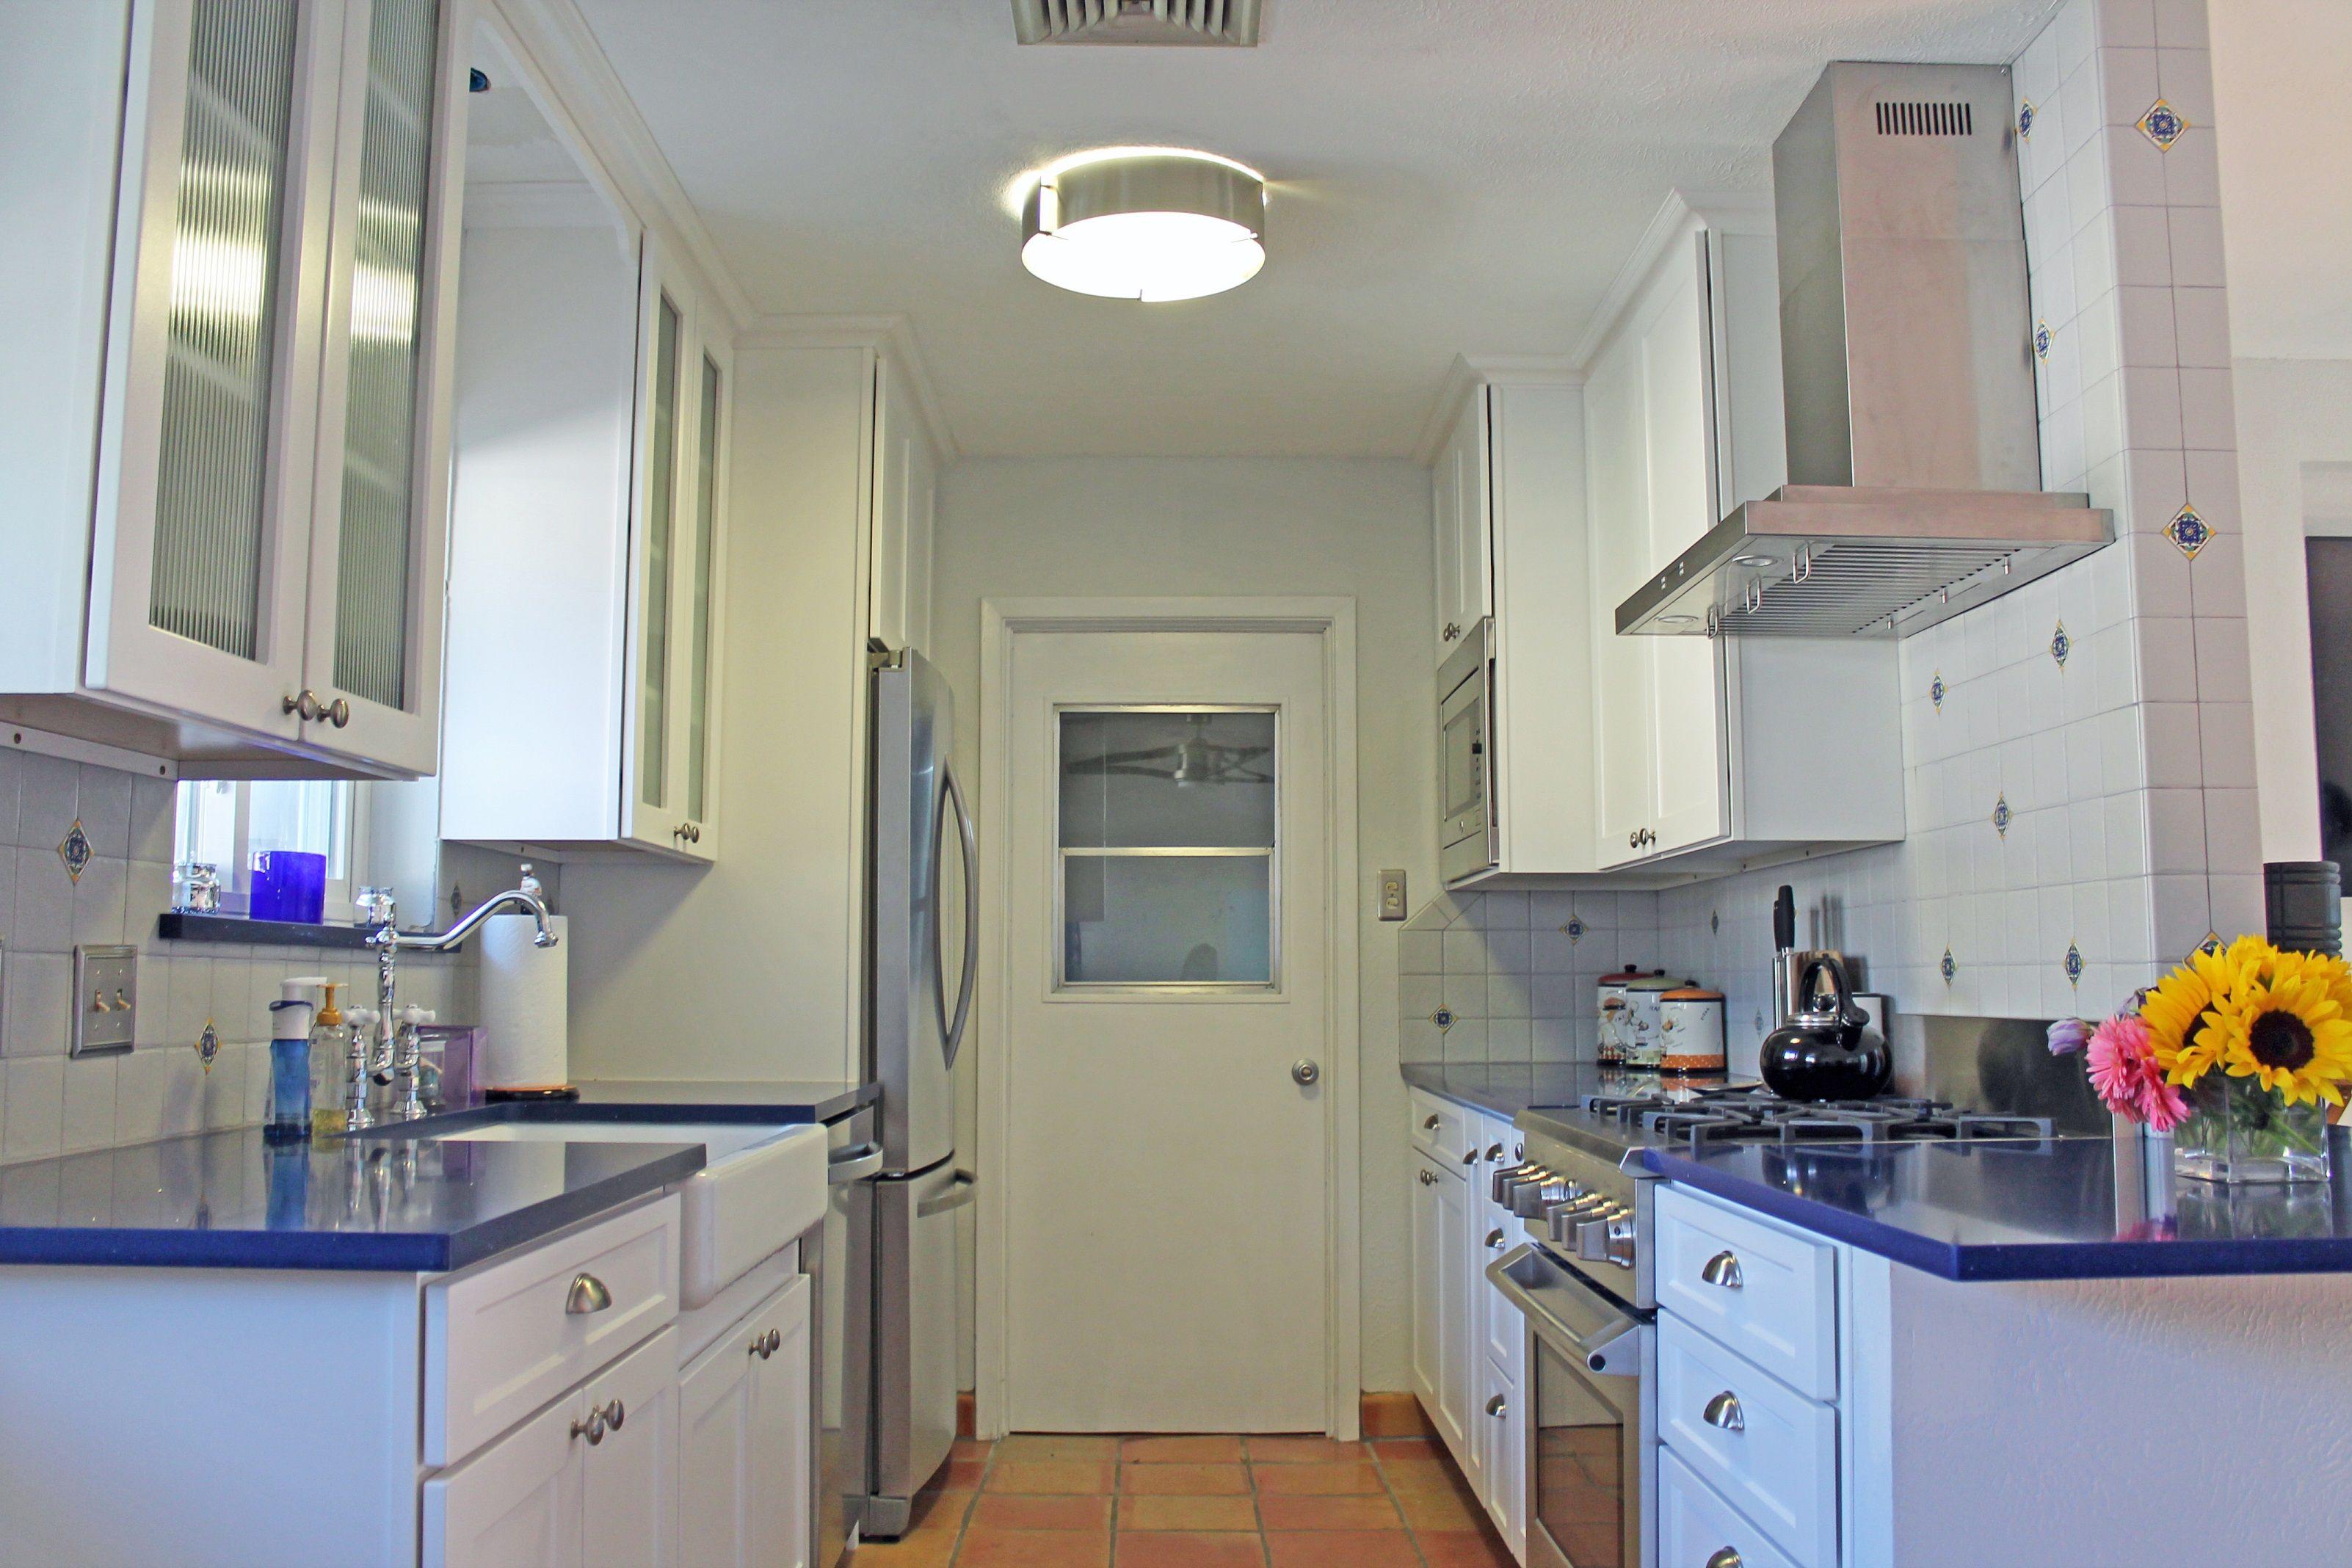 Spanish Modern Kitchen Design White Cabinets Stainless Steel Appliances And Blue Quartz Countertops Saltillo Floor Tile Home Kitchens Flooring Countertops